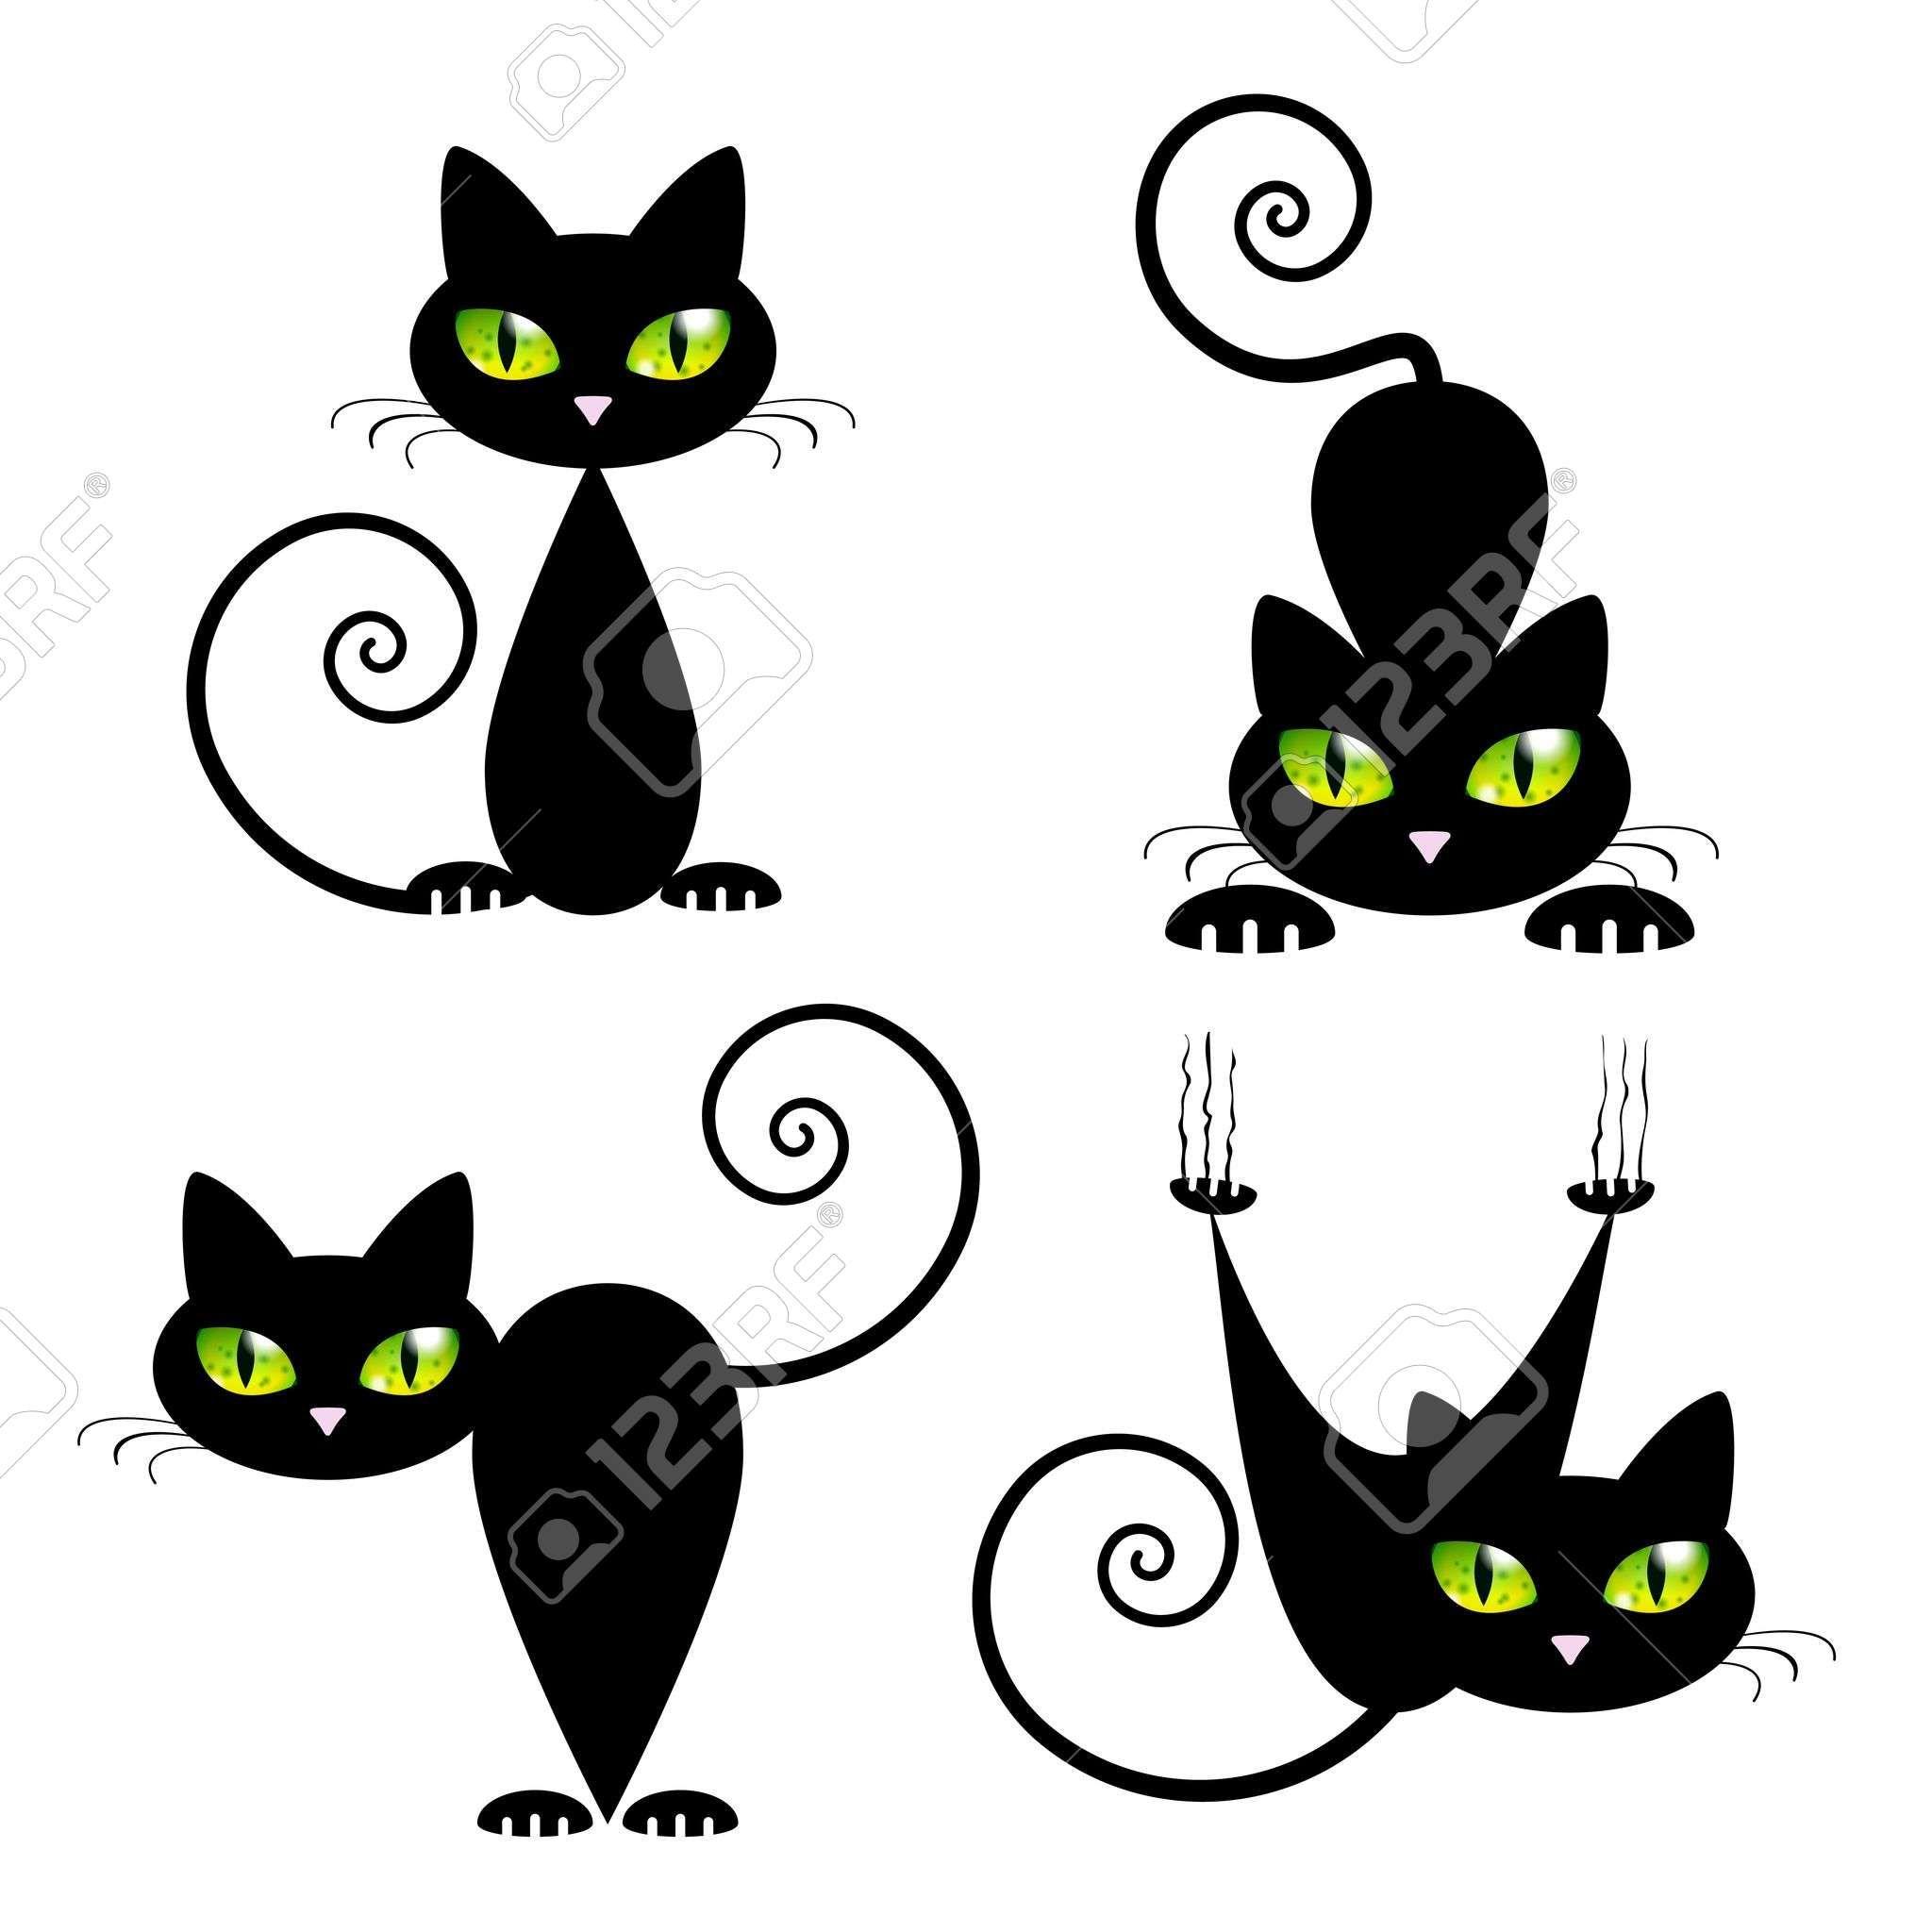 2048x2048 Black Cat With Green Eyes Vector Illustration Blanco Y Negro